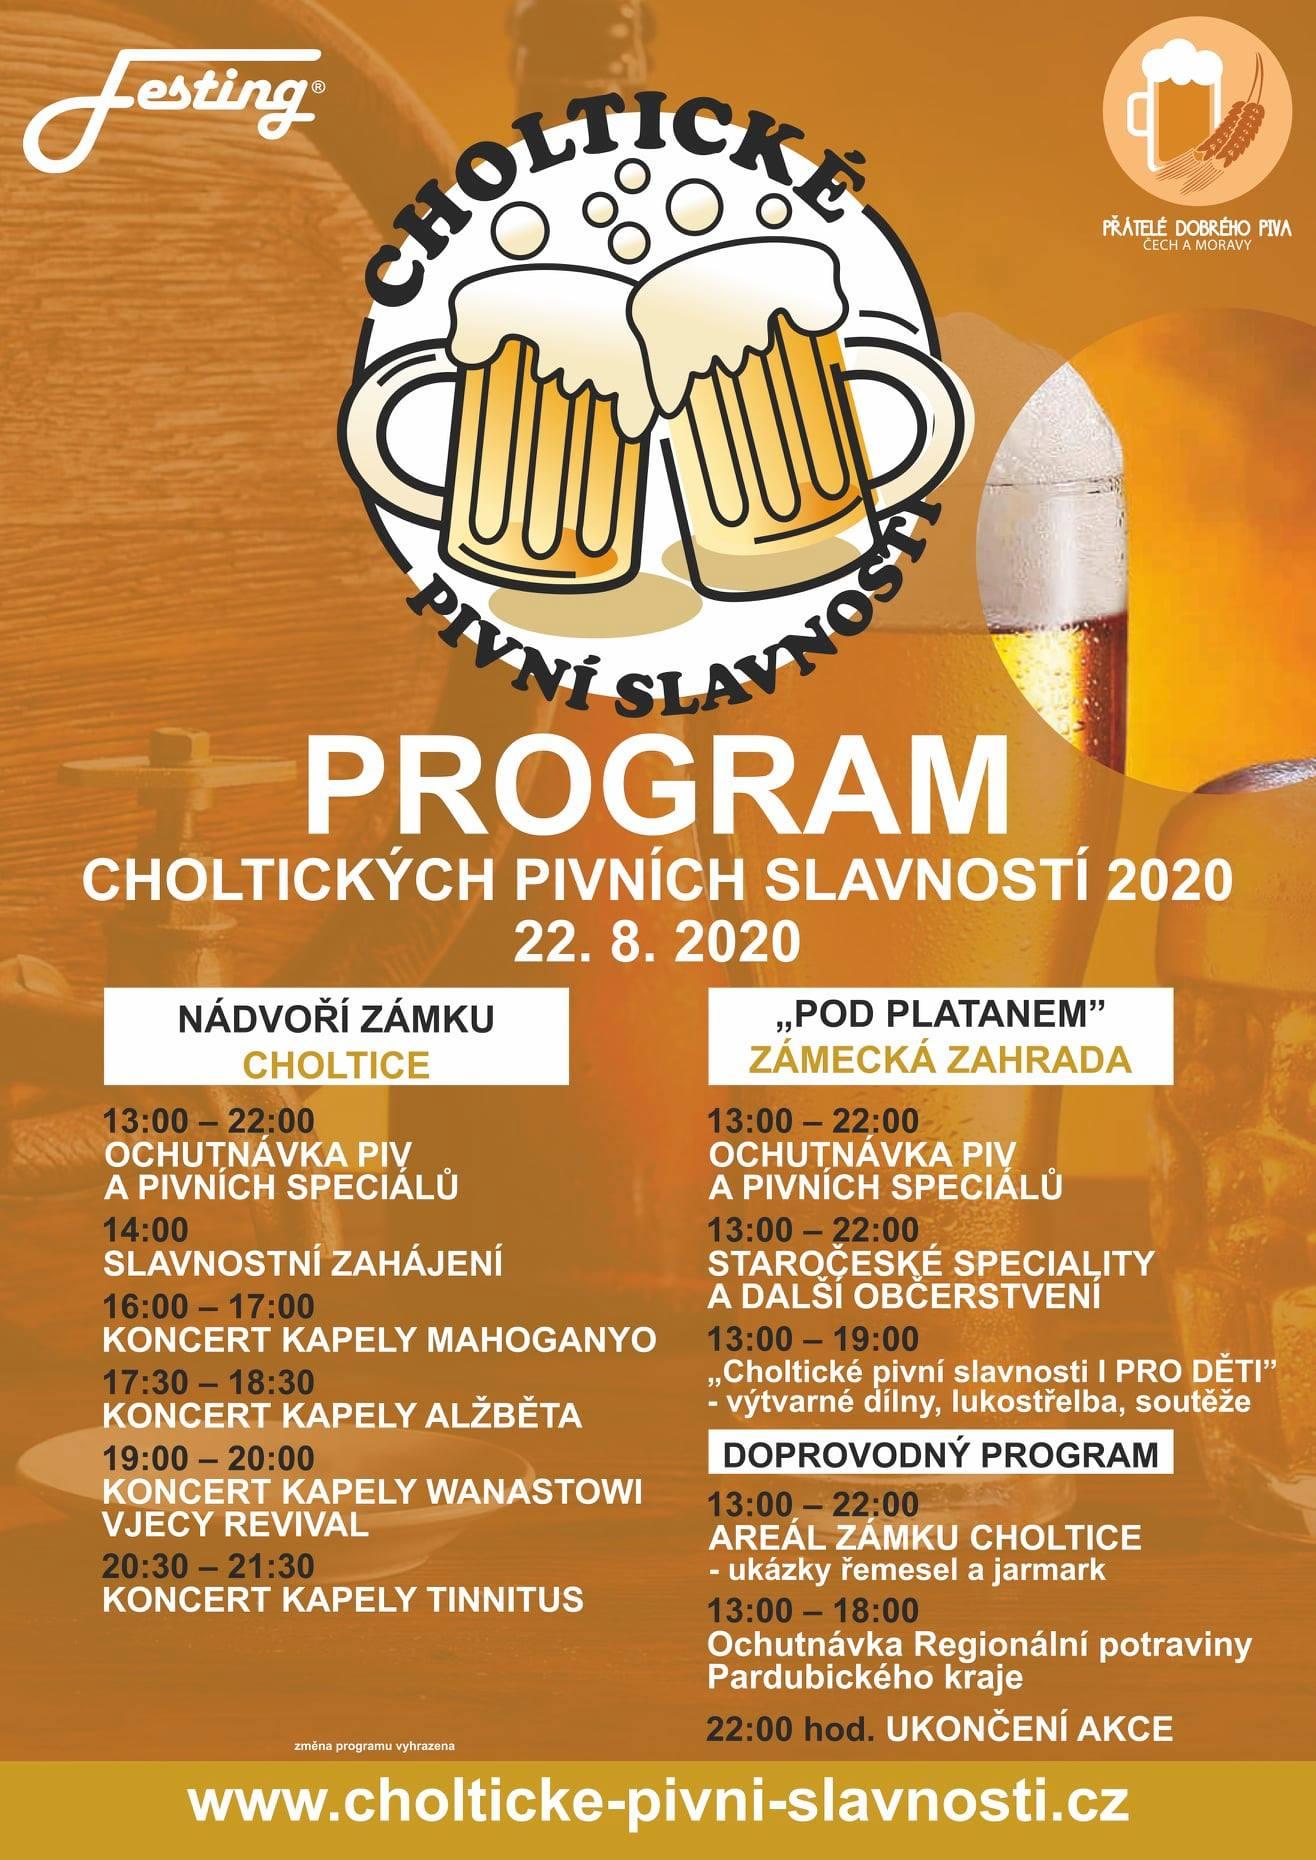 pivovary-pivni-akce-cholticke-pivni-slavnosti-2020